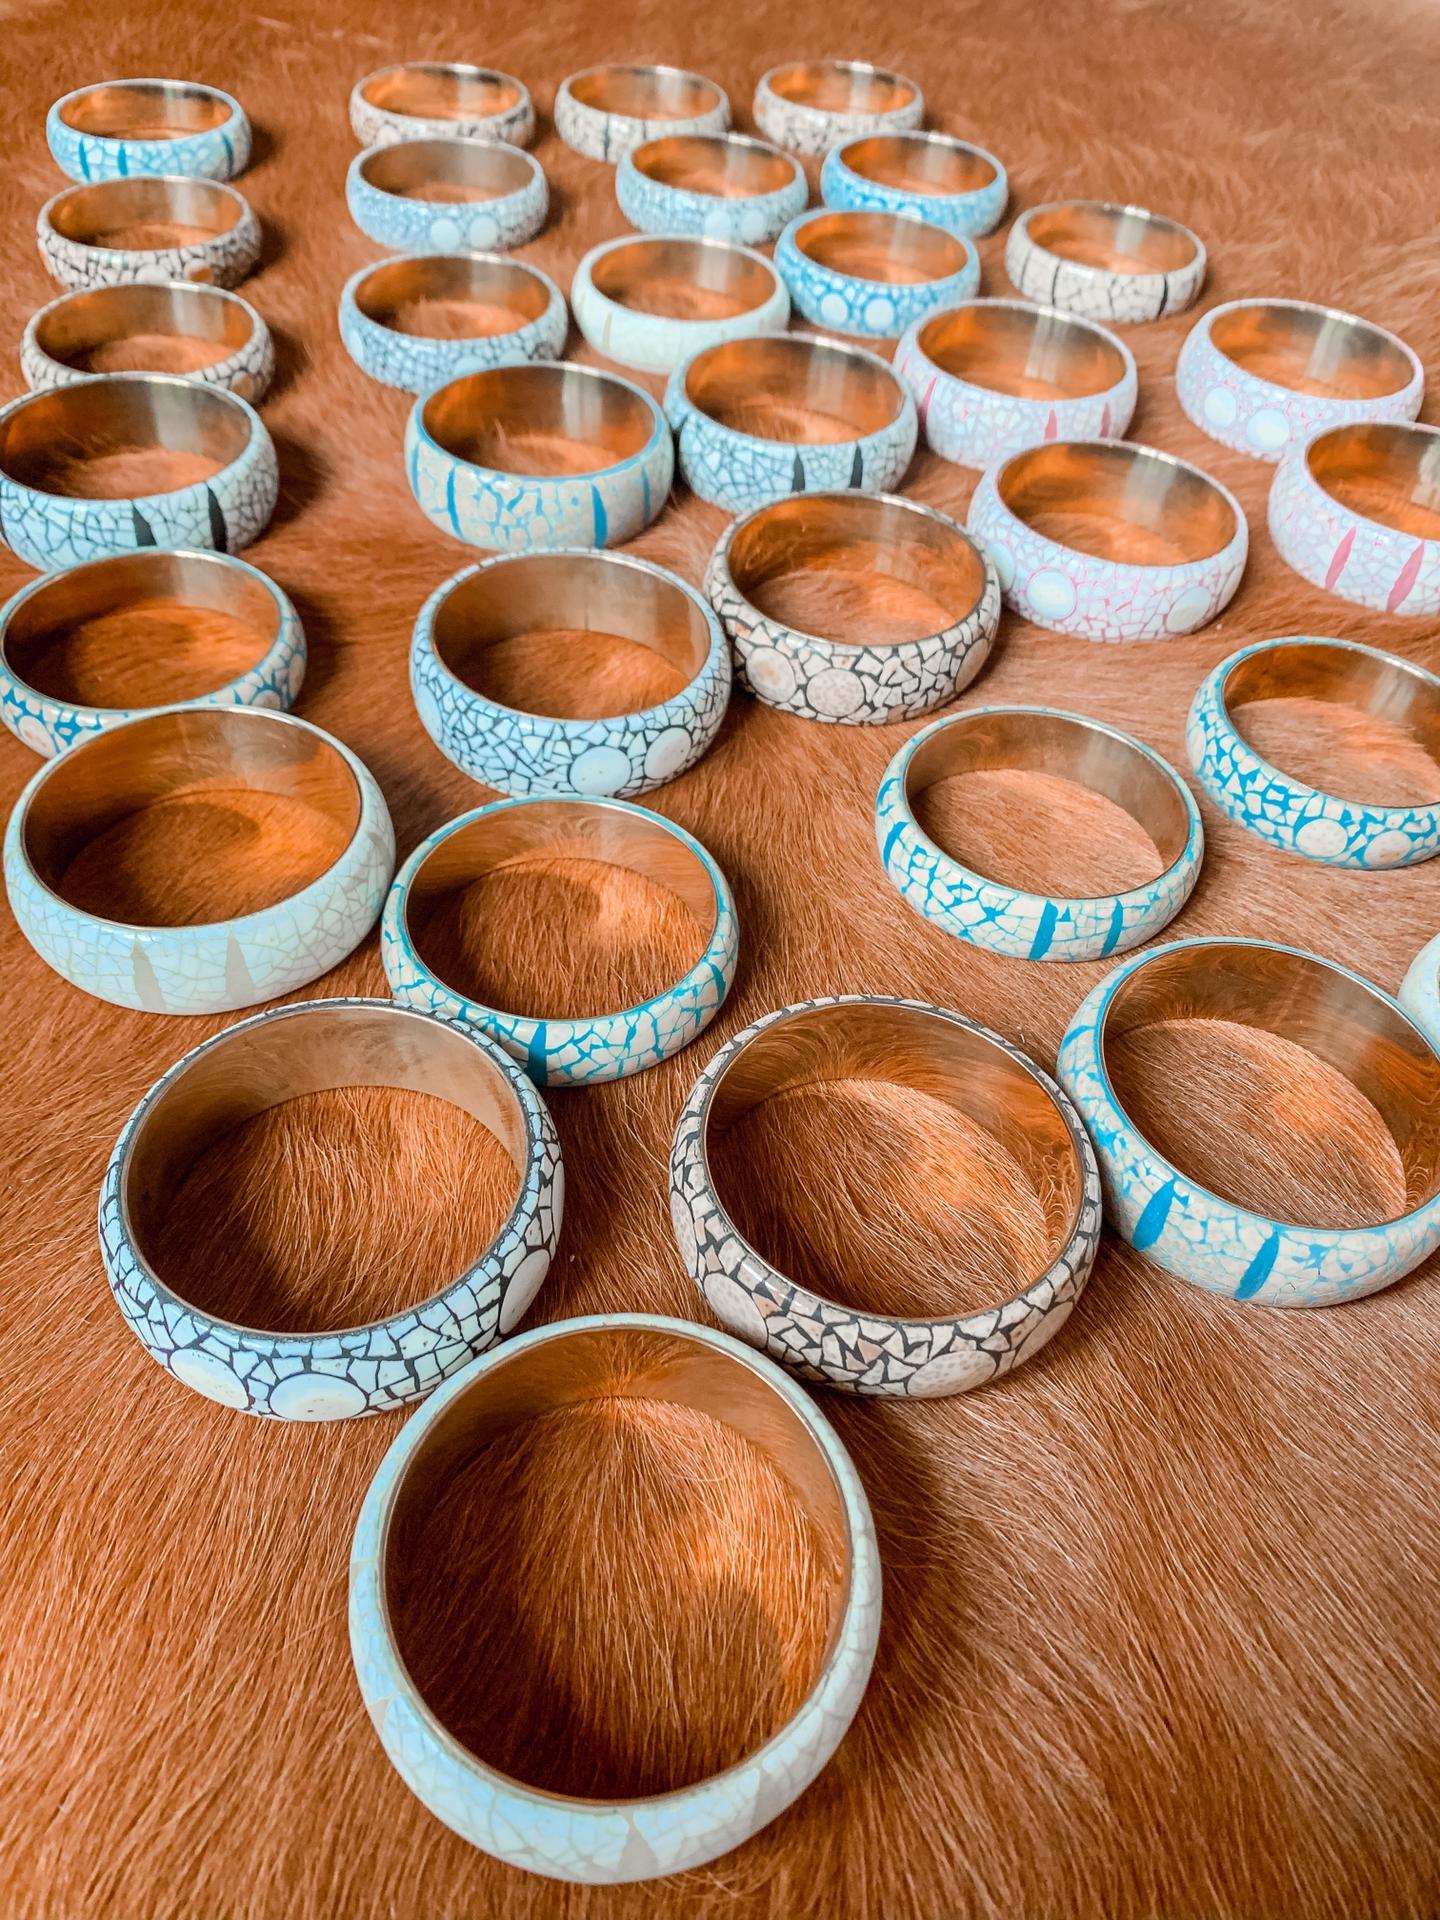 Armbanden in eggshel- small - 45€ / medium - 55€ - (ook apart verkrijgbaar)